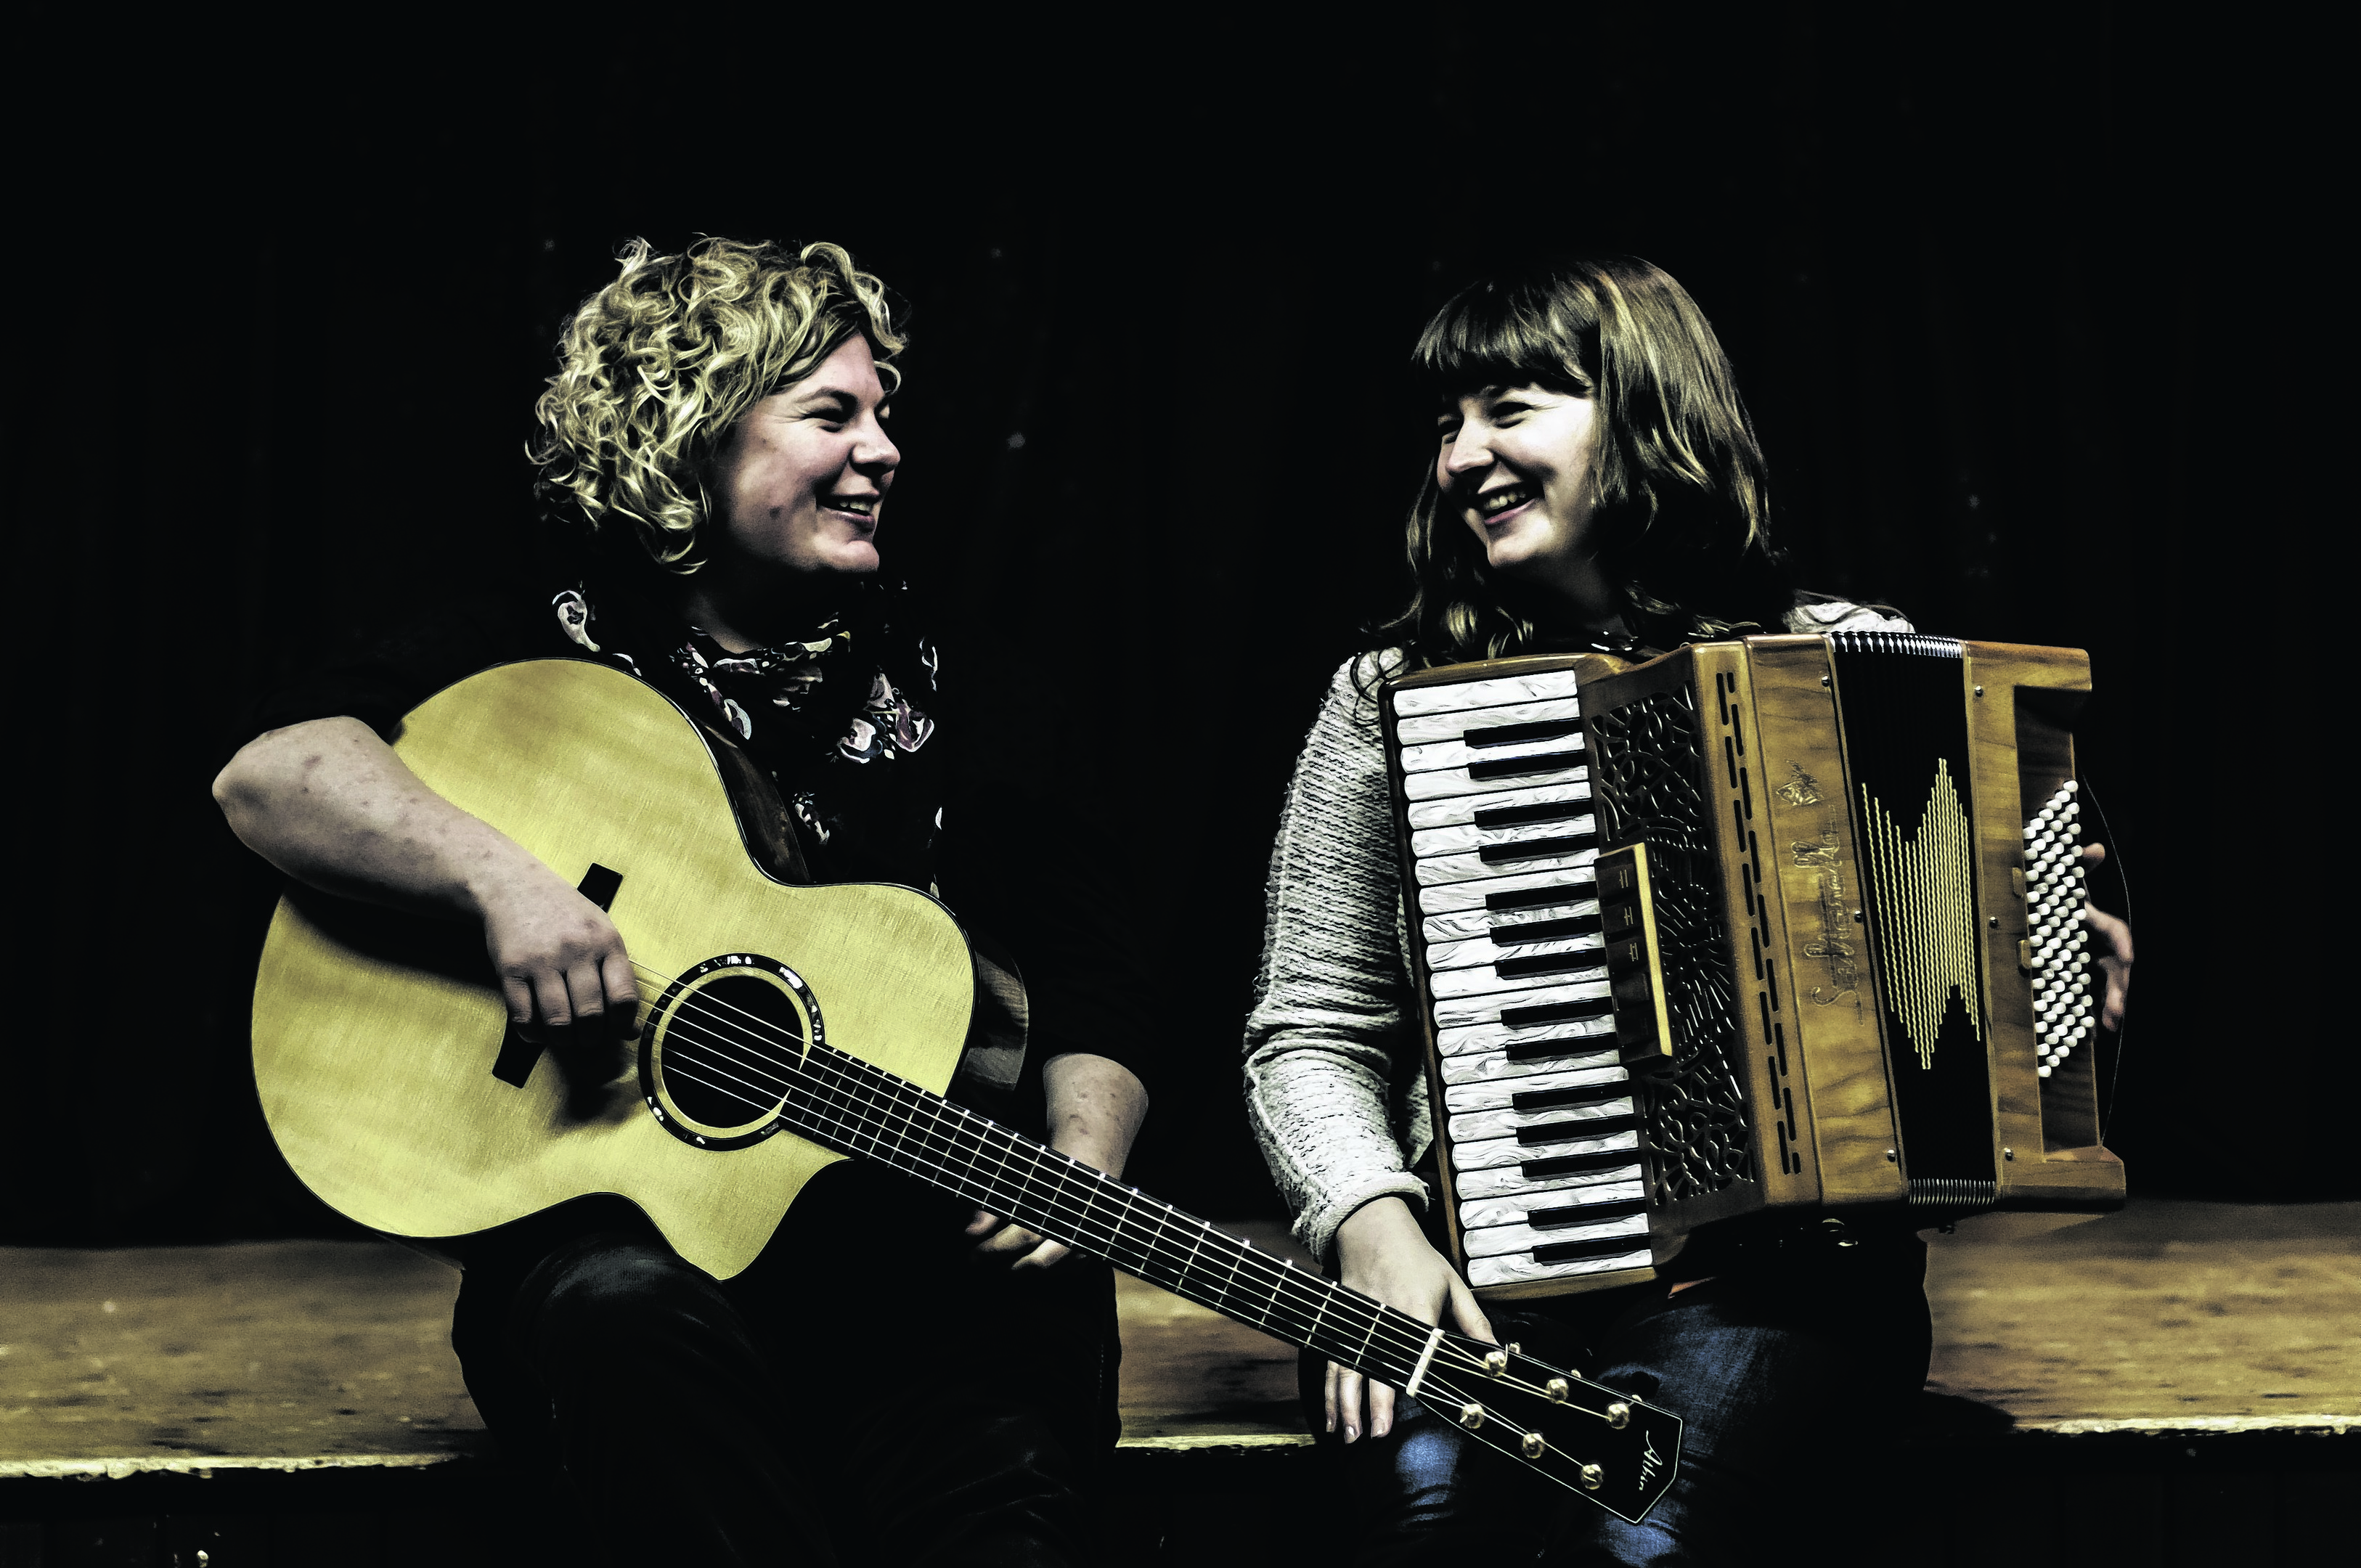 Mairearad and Anna